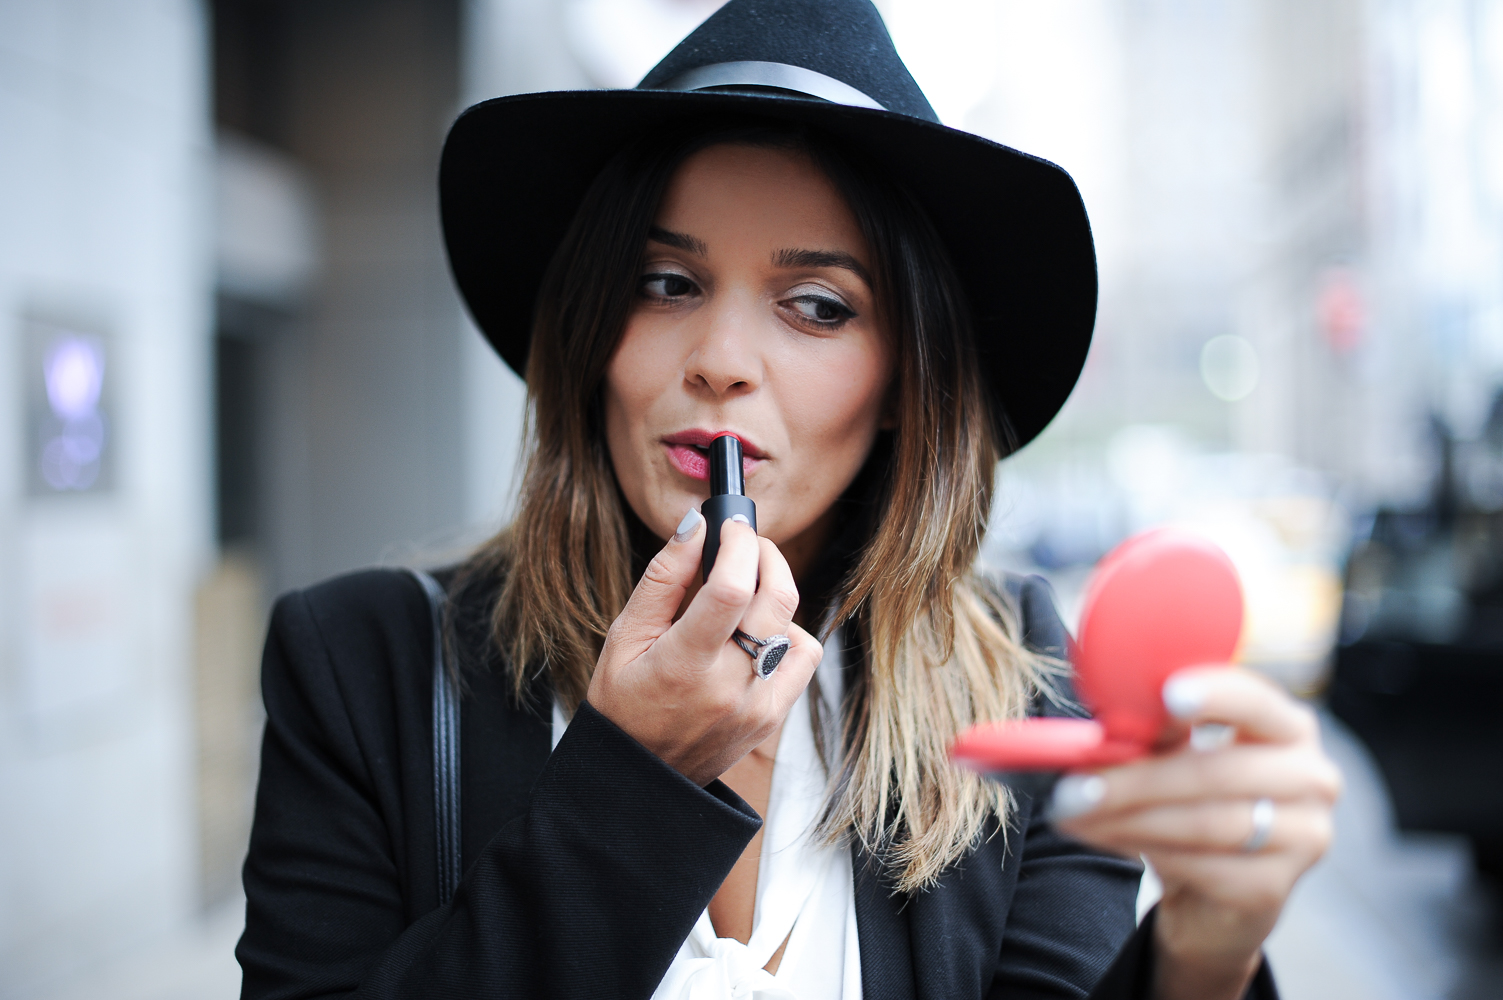 buxom lipsticks